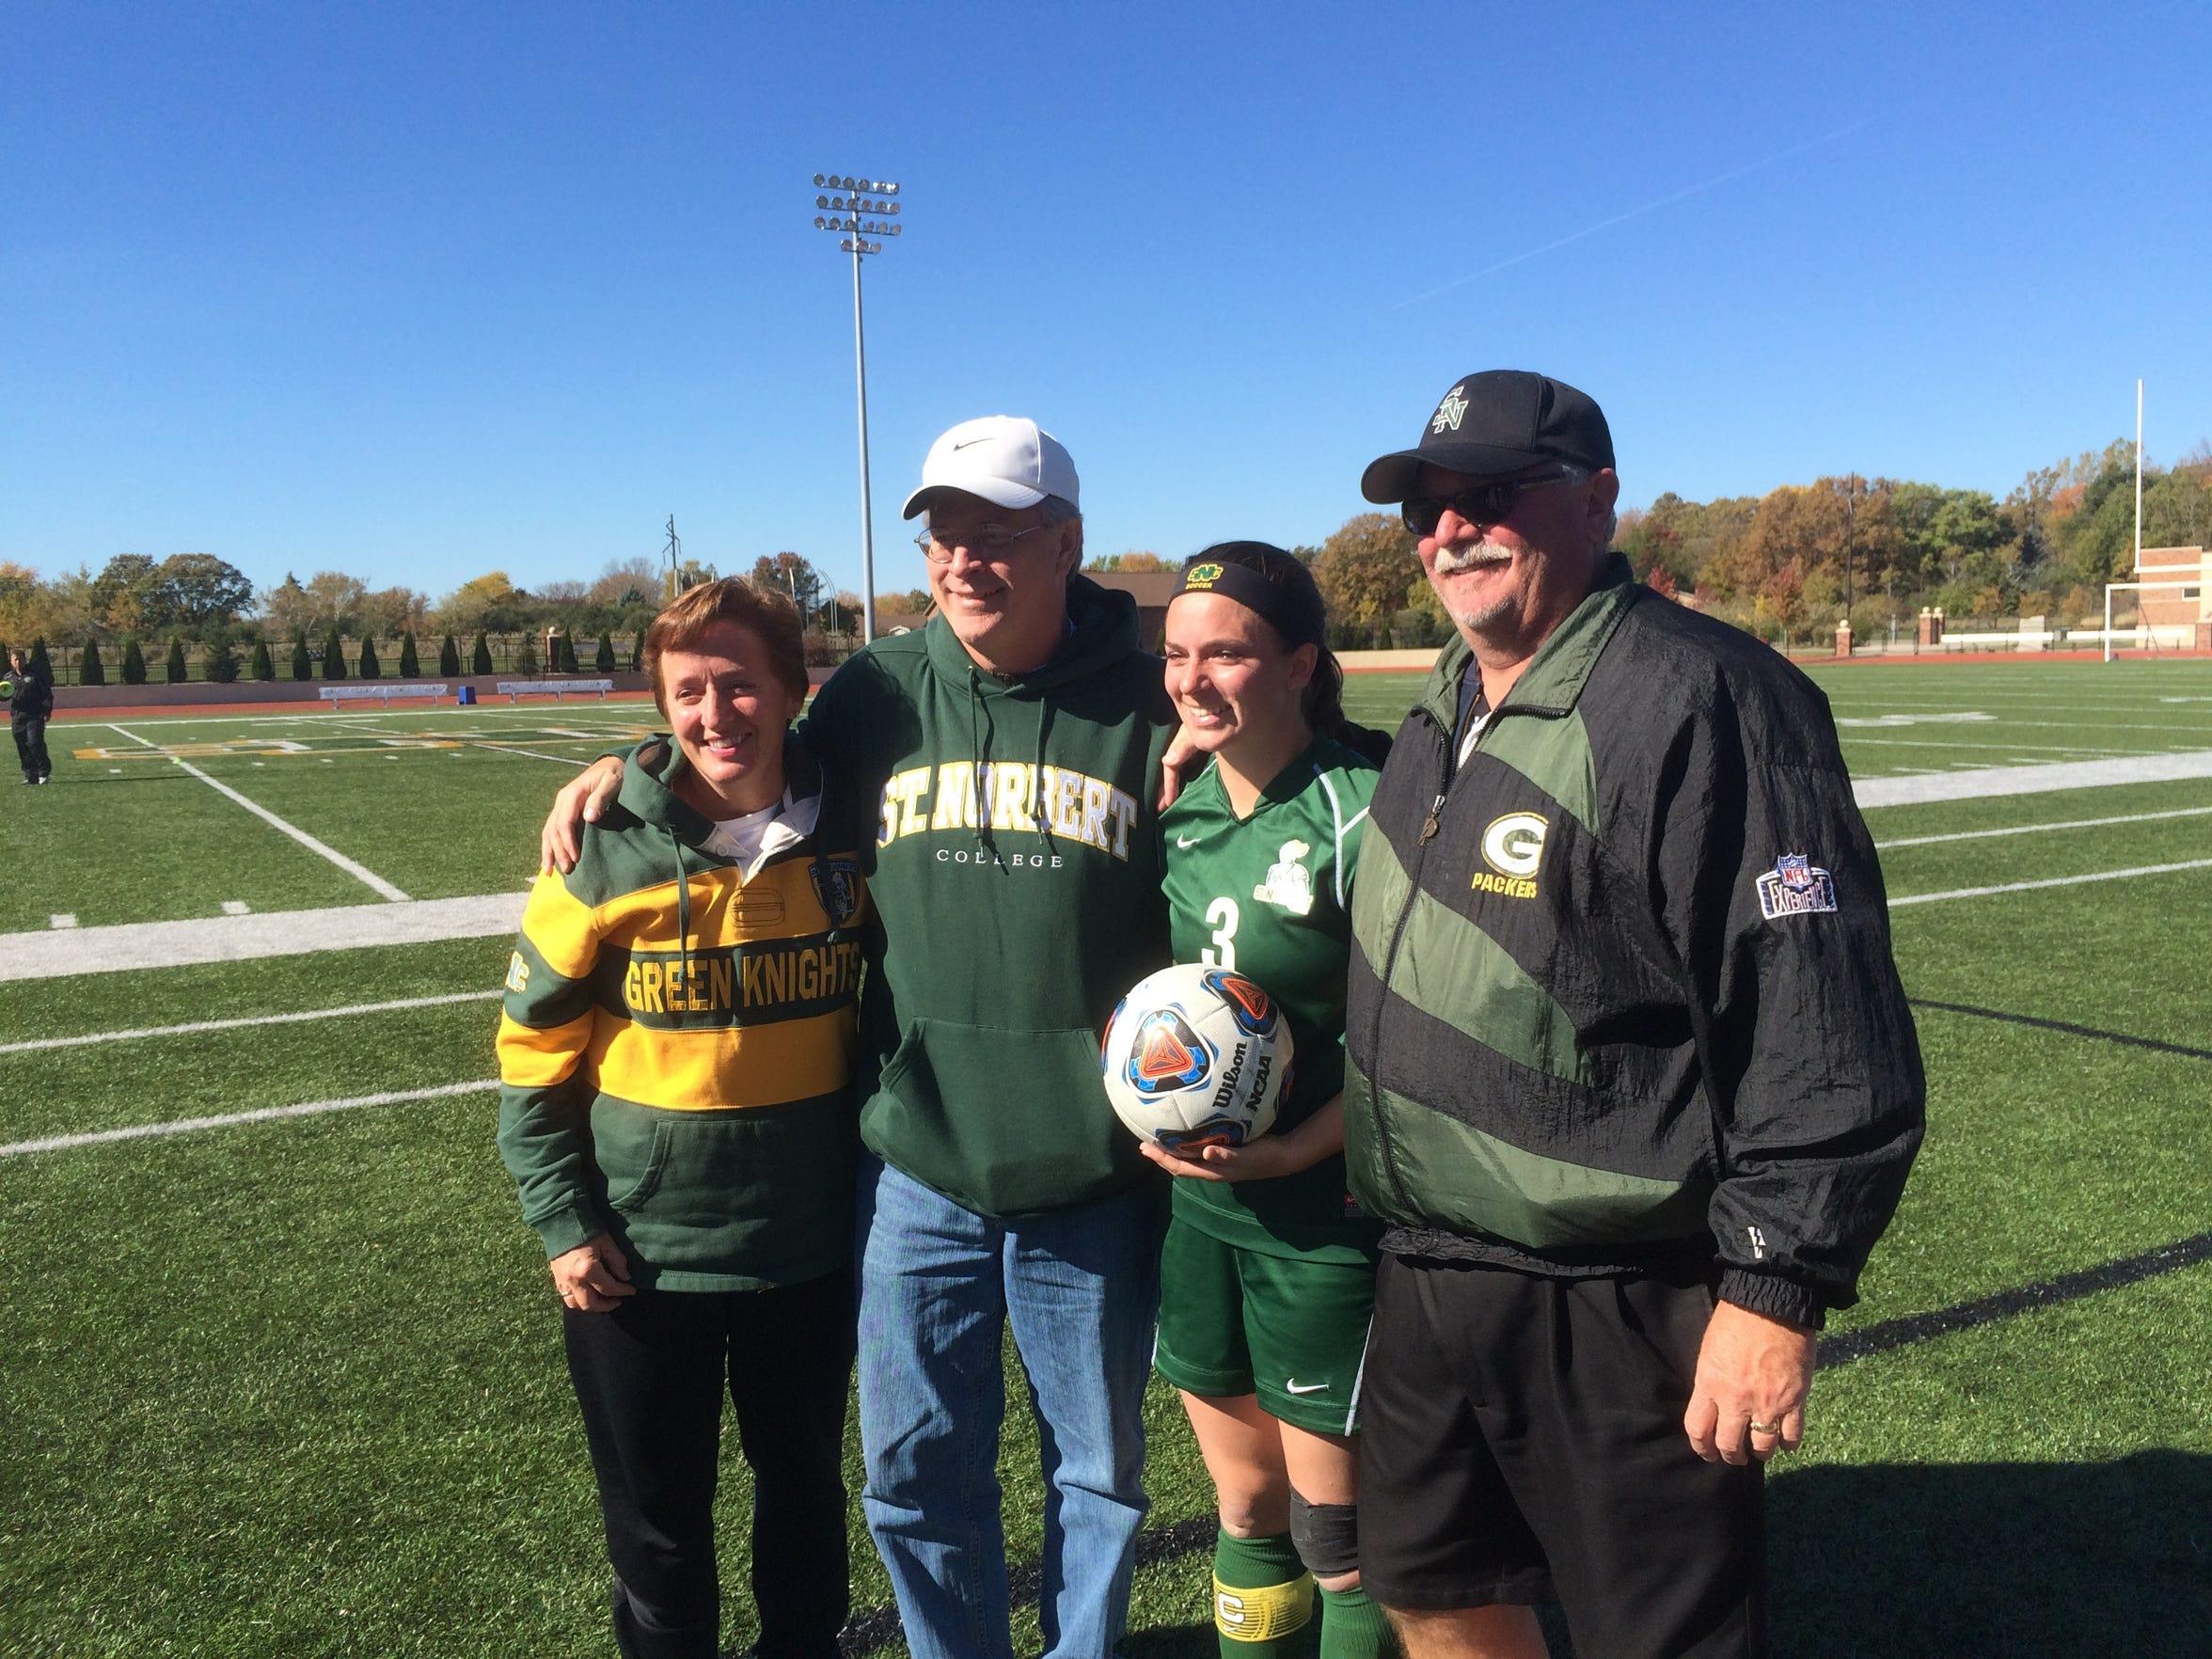 St. Norbert College senior Katie Vanden Avond receives